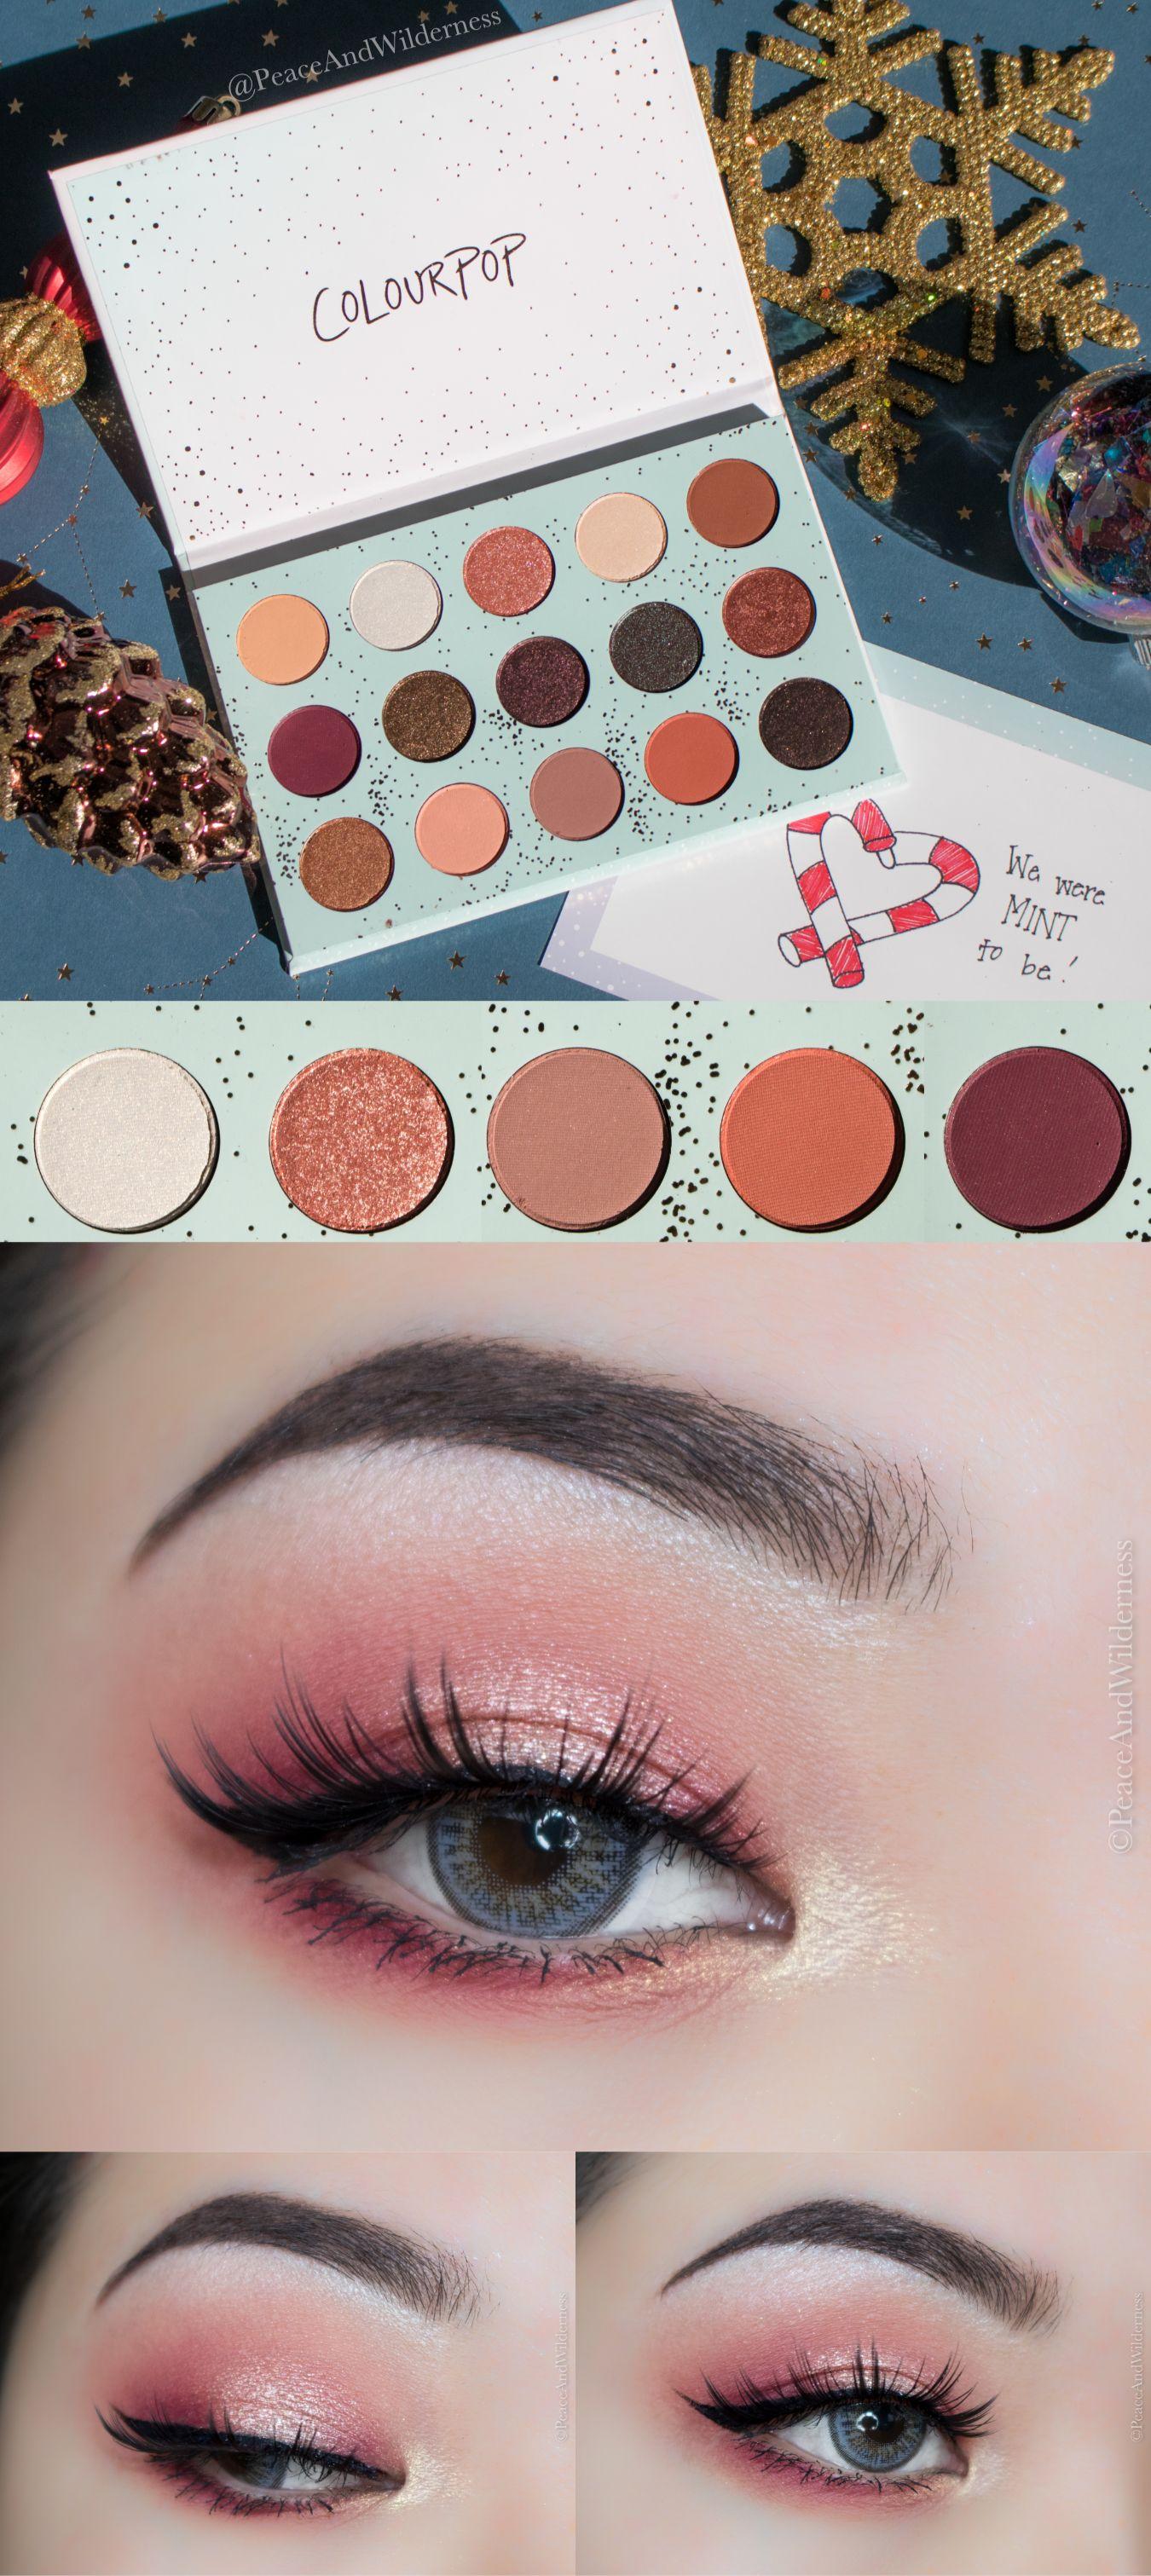 Cranberry Eyeshadow: Warm Peachy Cranberry Eyeshadow Makeup Created Using